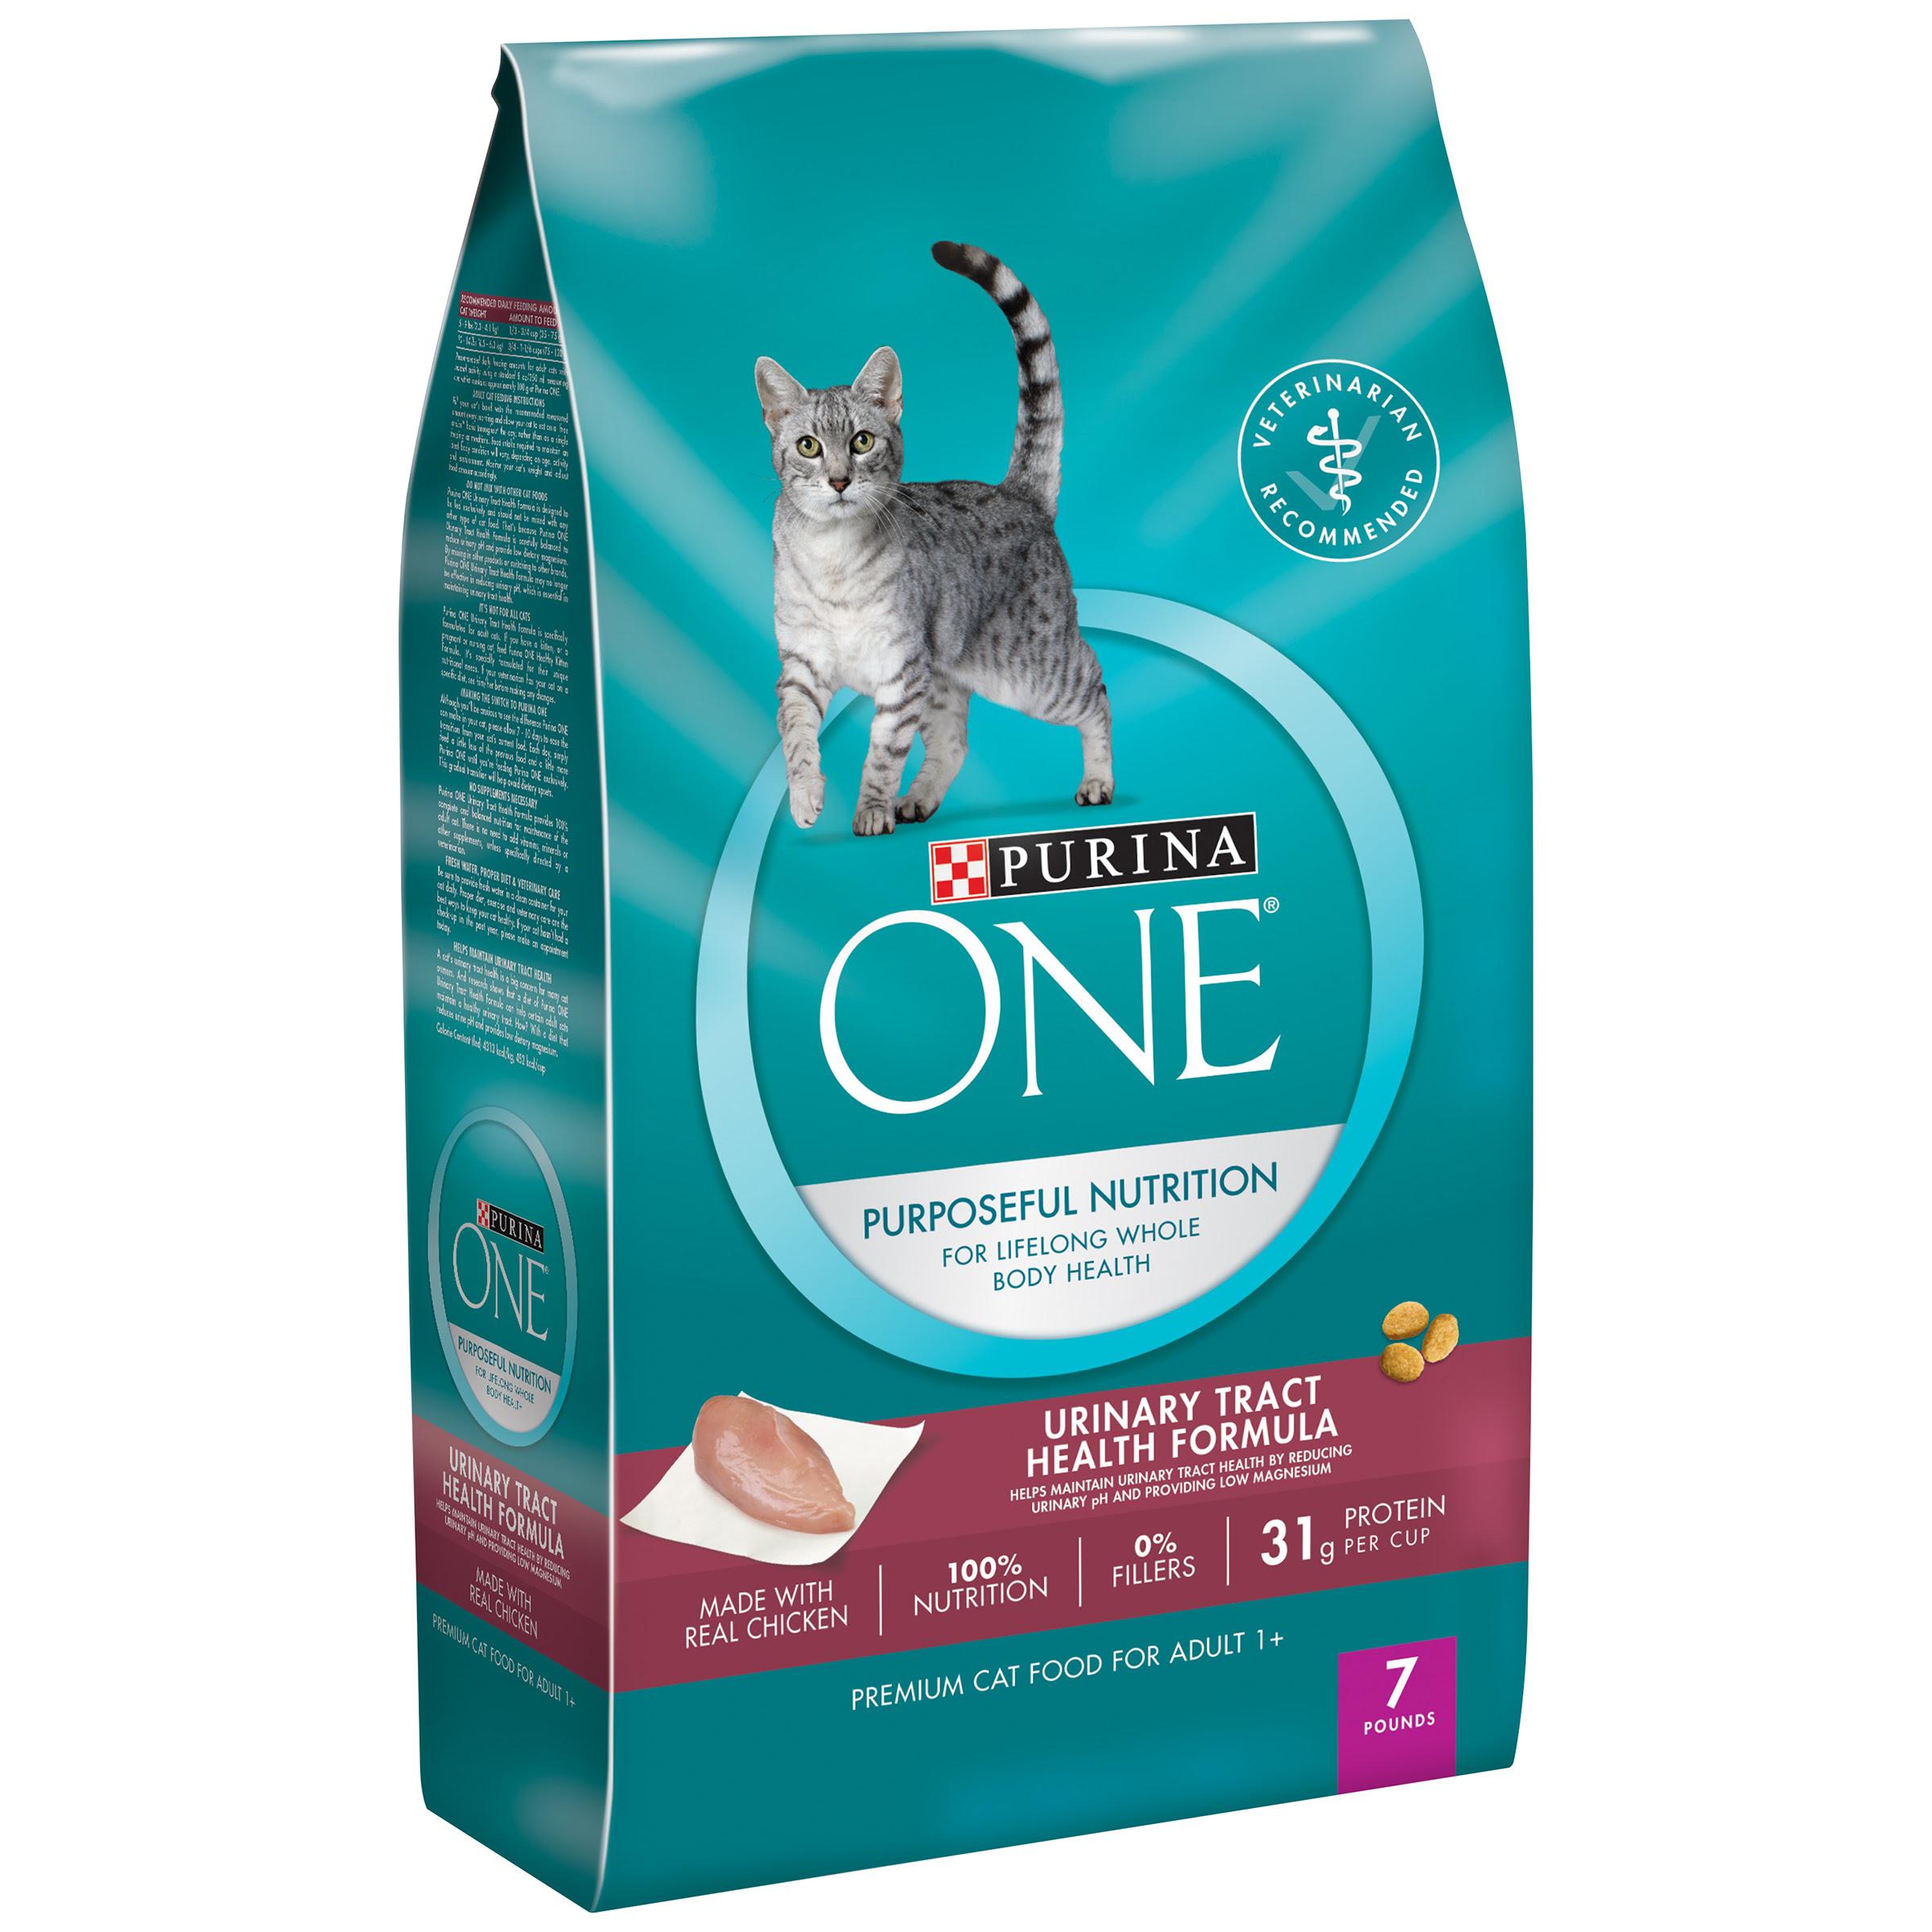 Purina ONE Urinary Tract Health Formula Adult Premium Cat ...